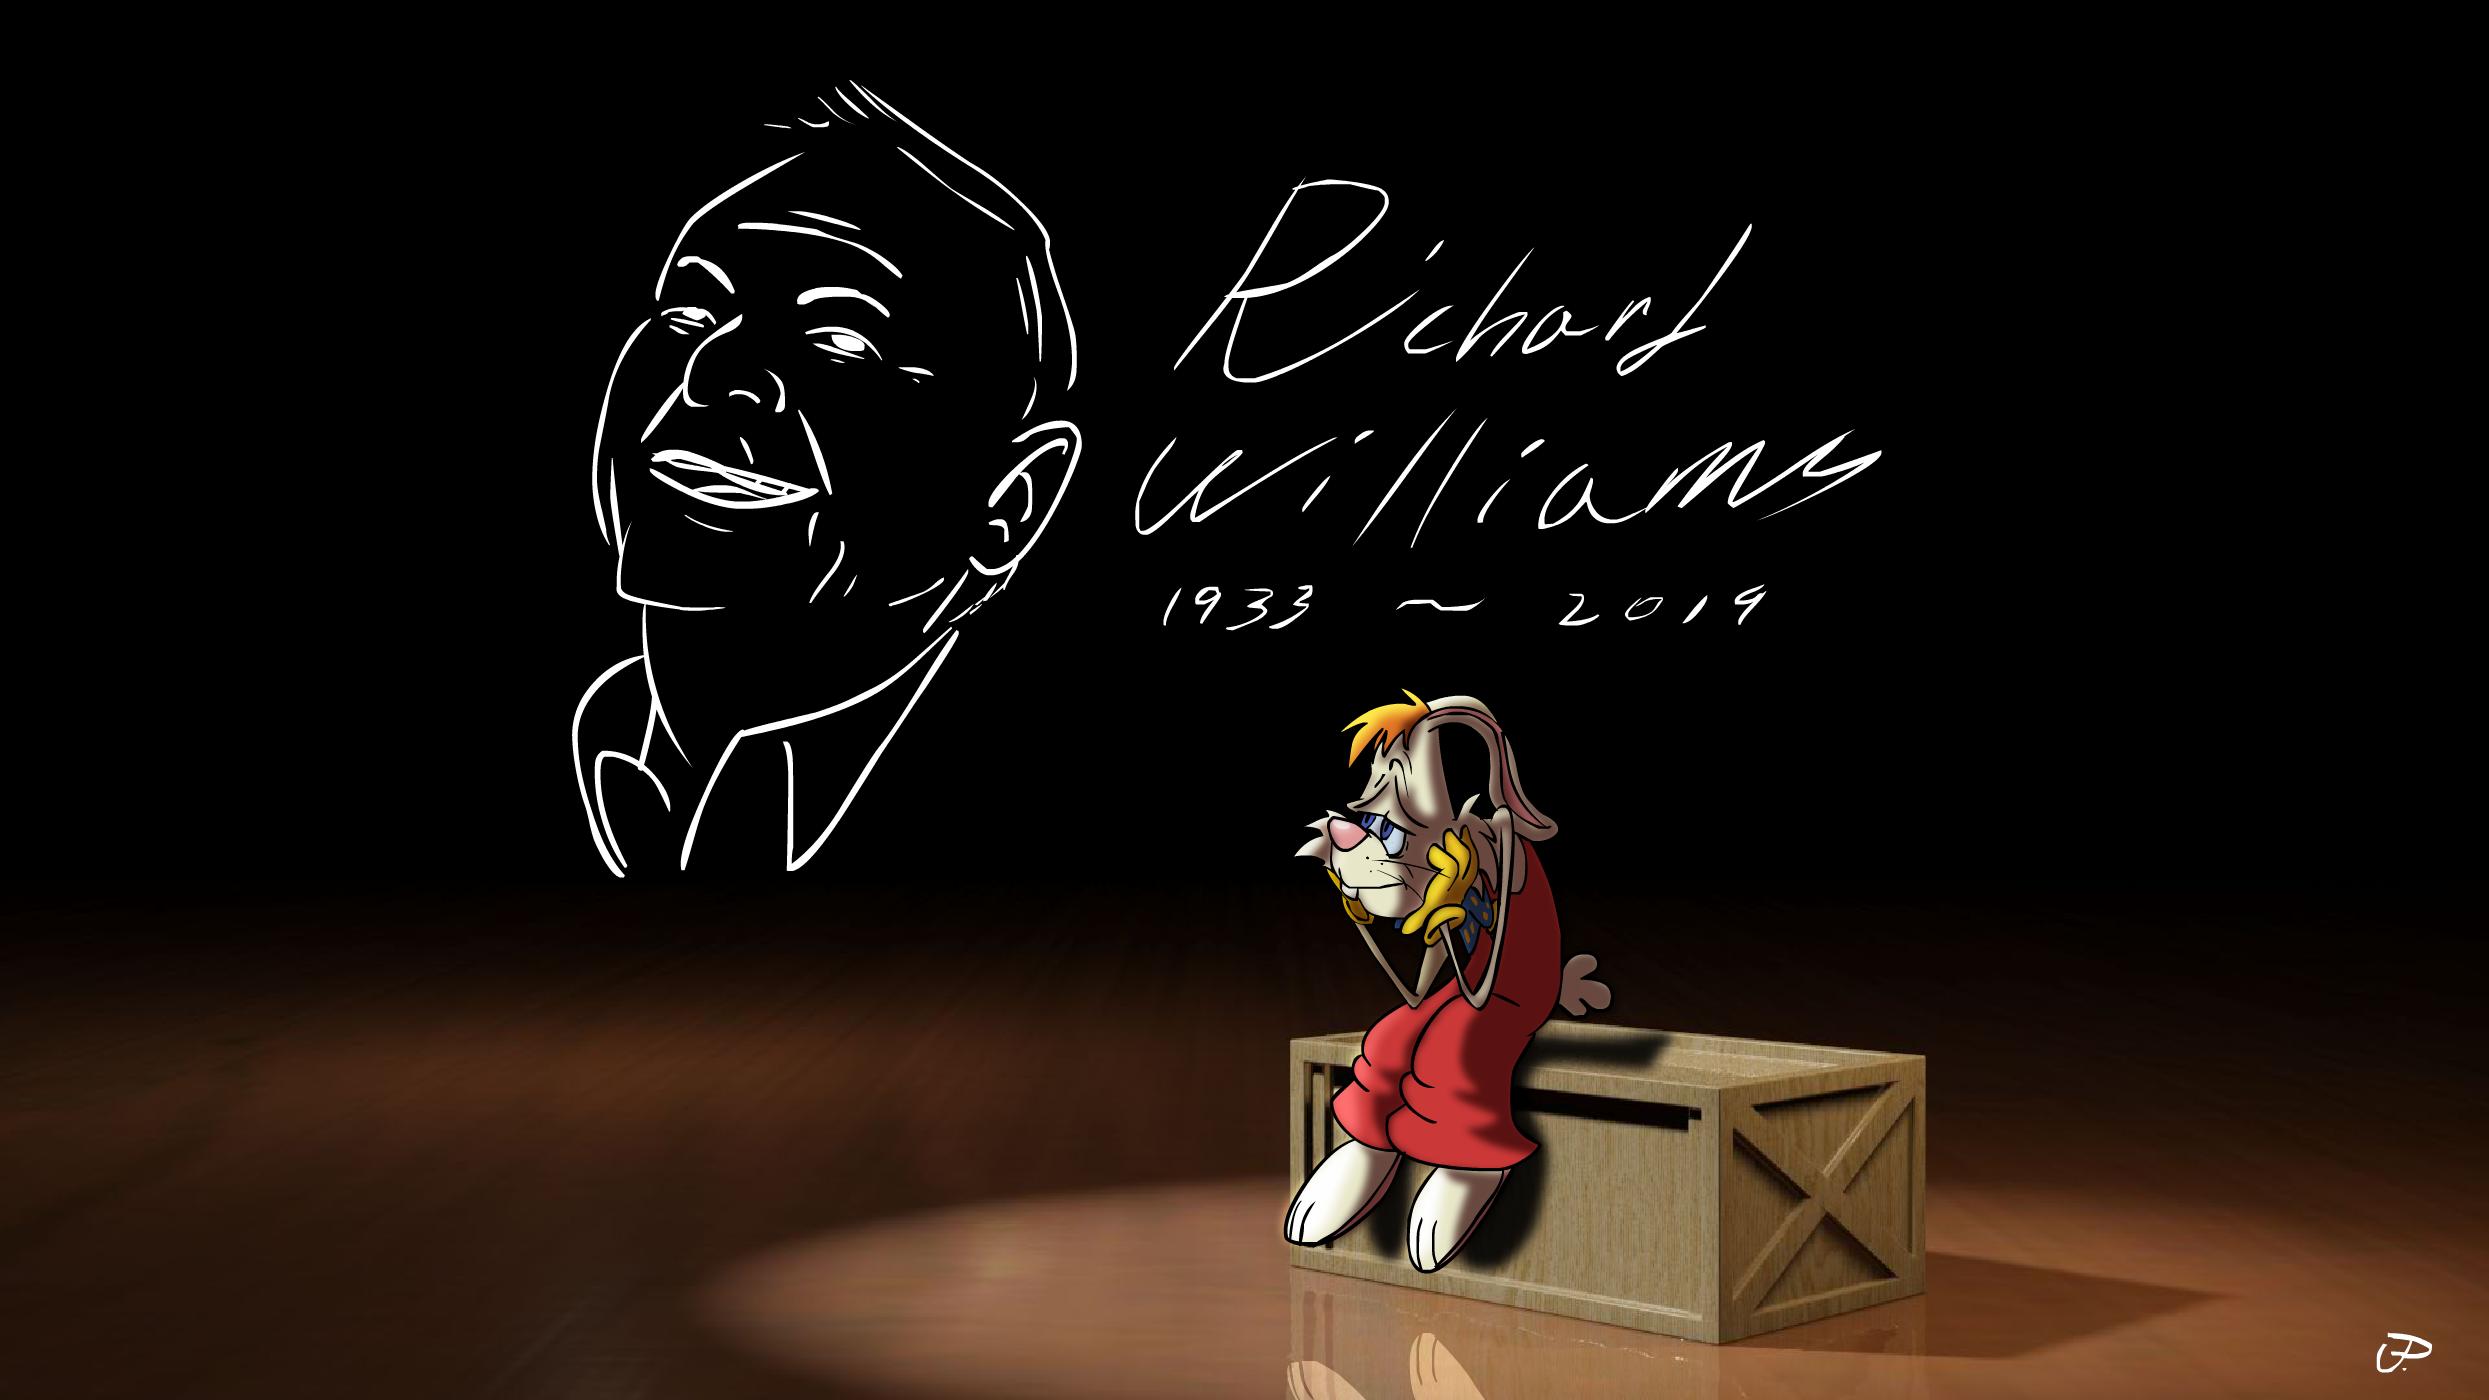 Richard Williams 1933 - 2019